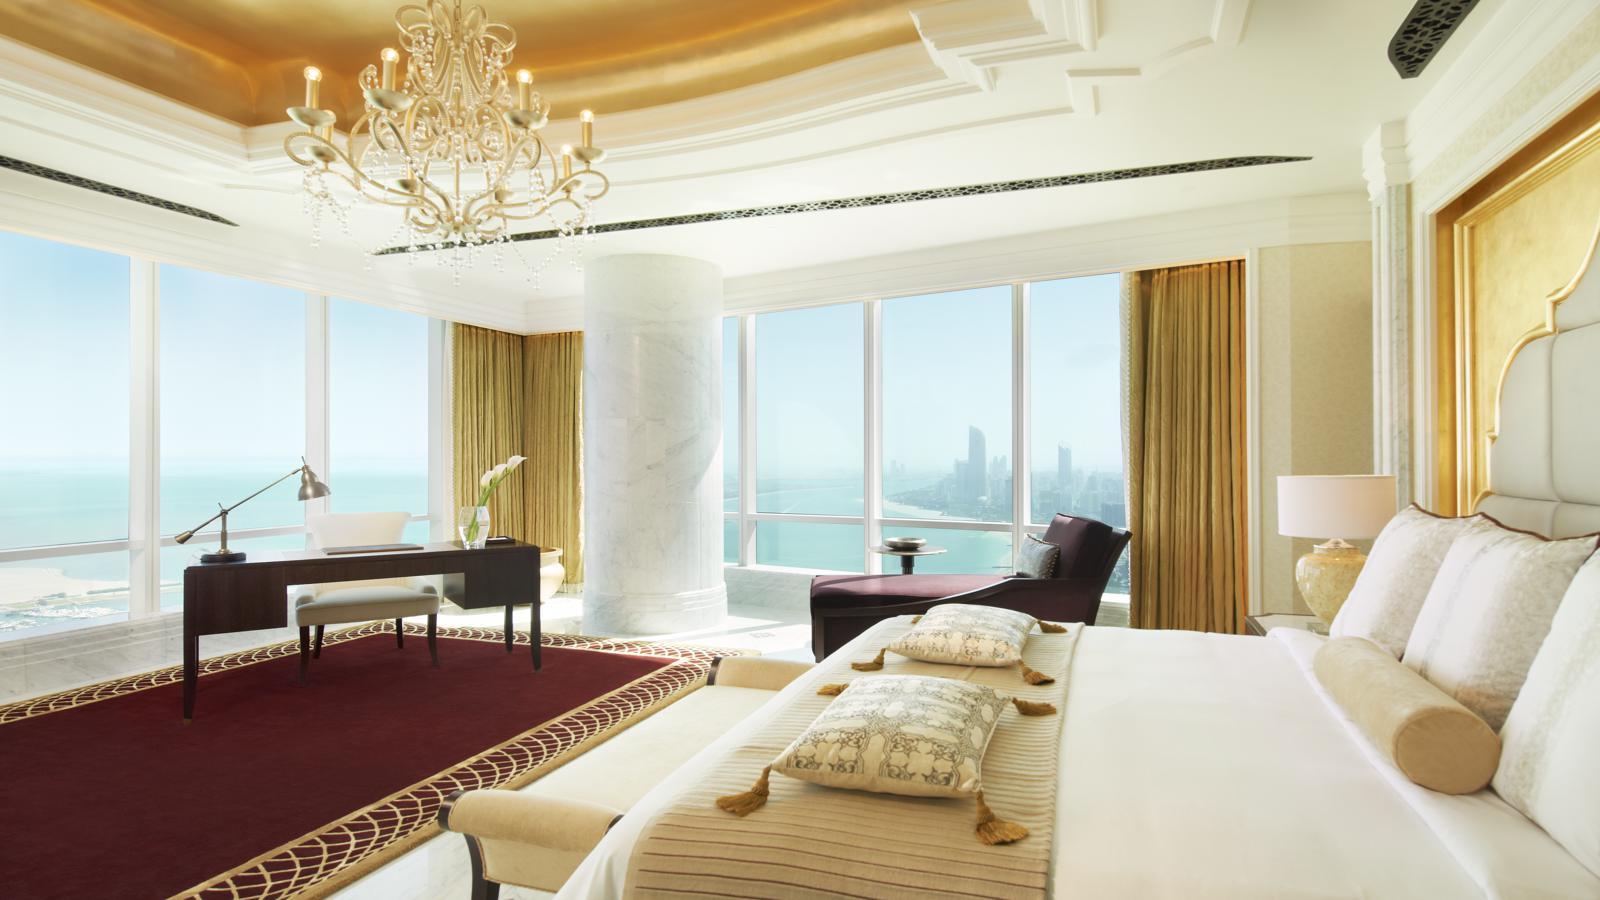 St Regis Abu Dhabi Suite